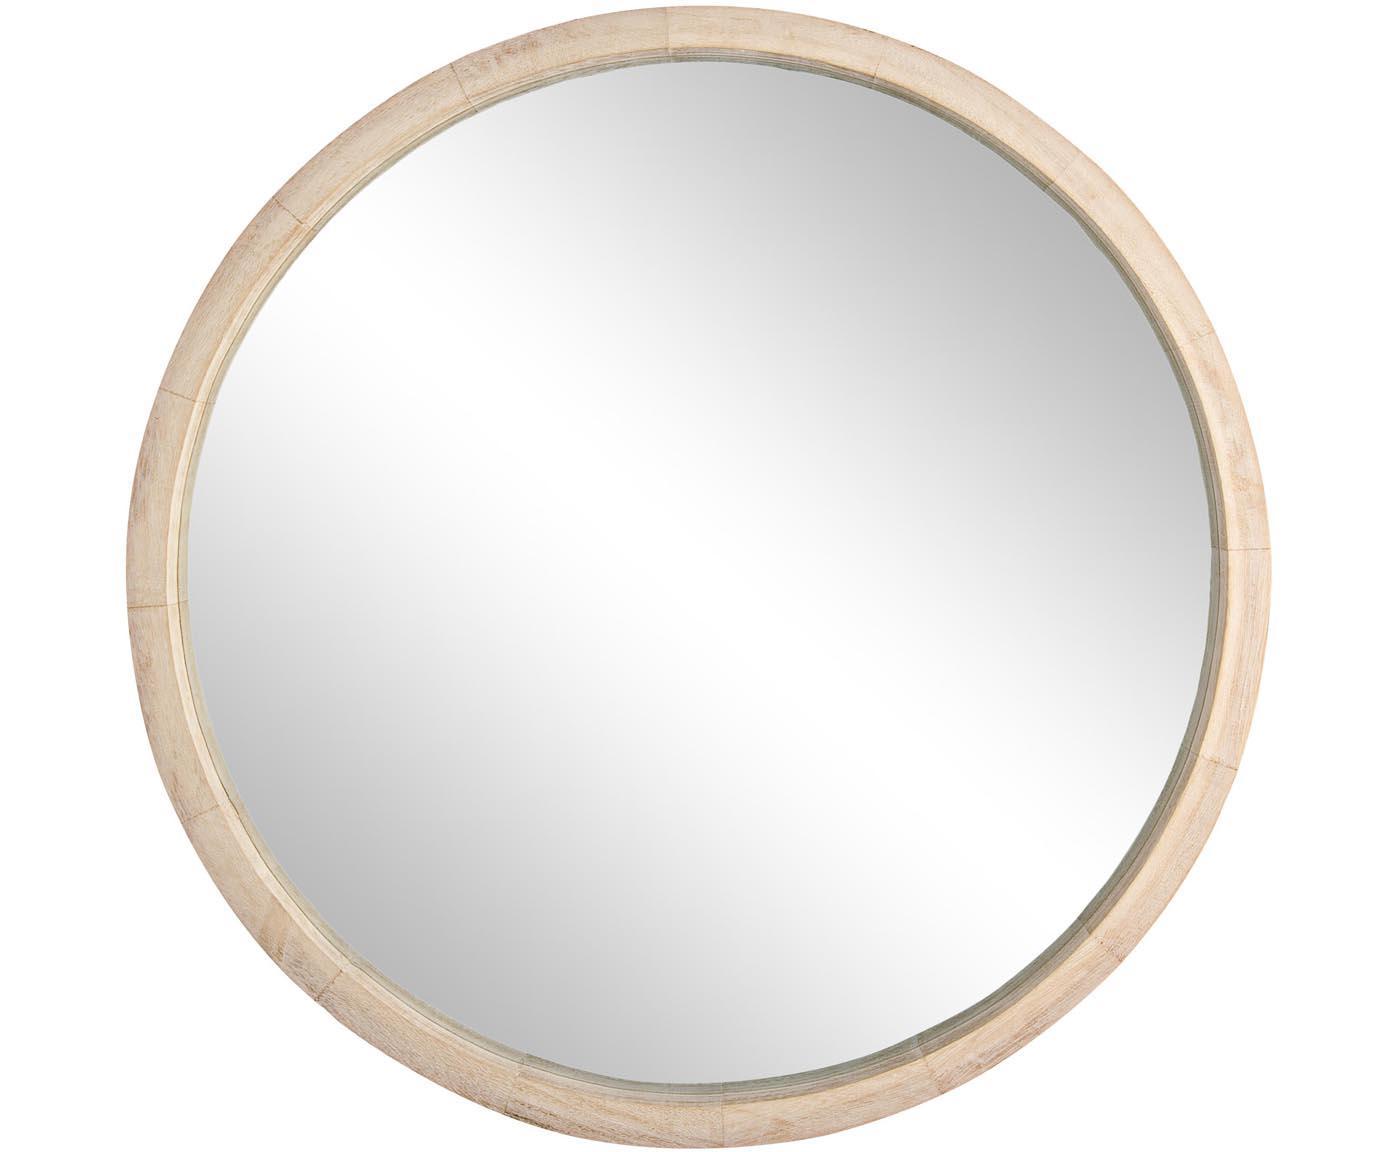 Runder Wandspiegel Tiziano mit Holzrahmen, Rahmen: Paulowniaholz, Spiegelfläche: Spiegelglas, Paulowniaholz, Ø 52 x H 52 cm